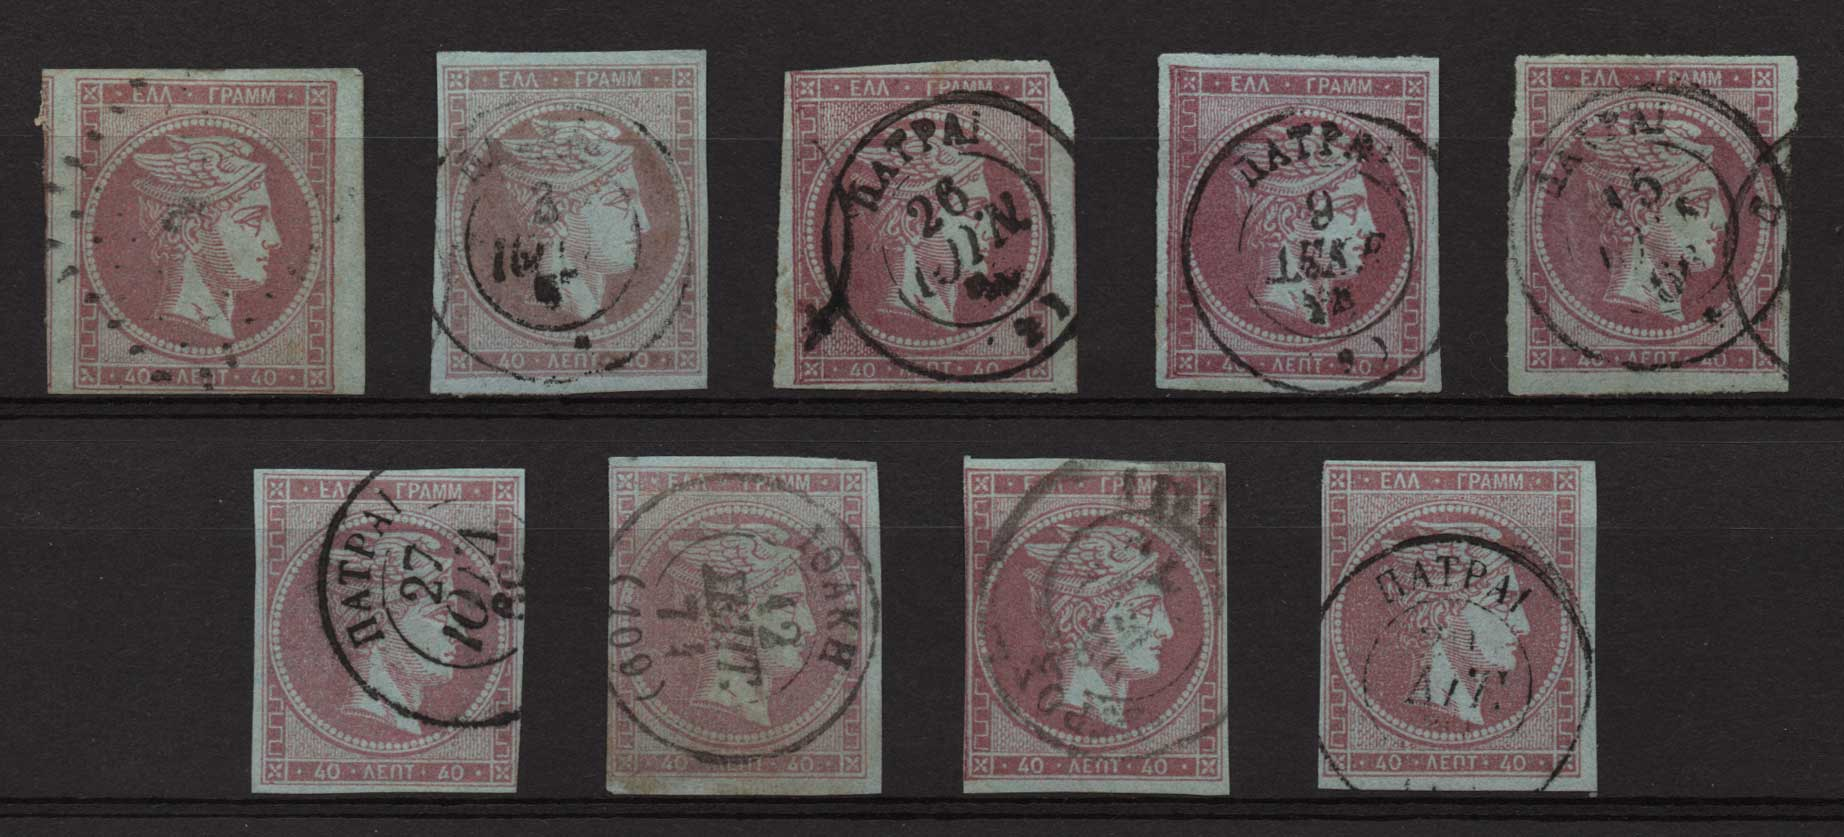 Lot 7 - GREECE-  LARGE HERMES HEAD large hermes head -  Athens Auctions Public Auction 55 General Stamp Sale